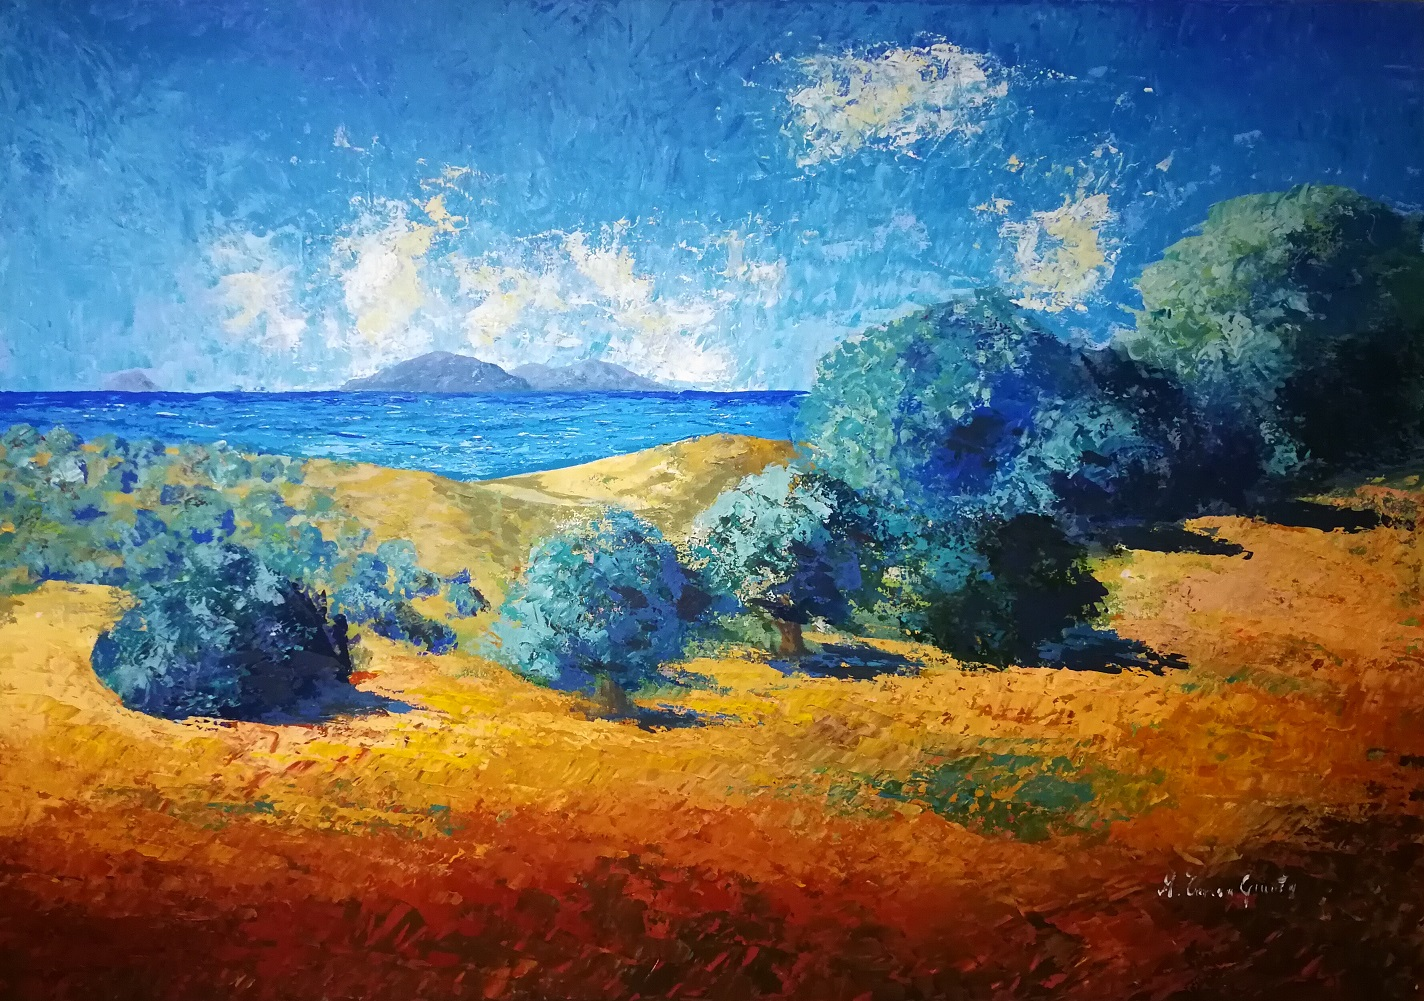 Maria Teresa Giunta, atmosfere impressioniste su scorci mediterranei